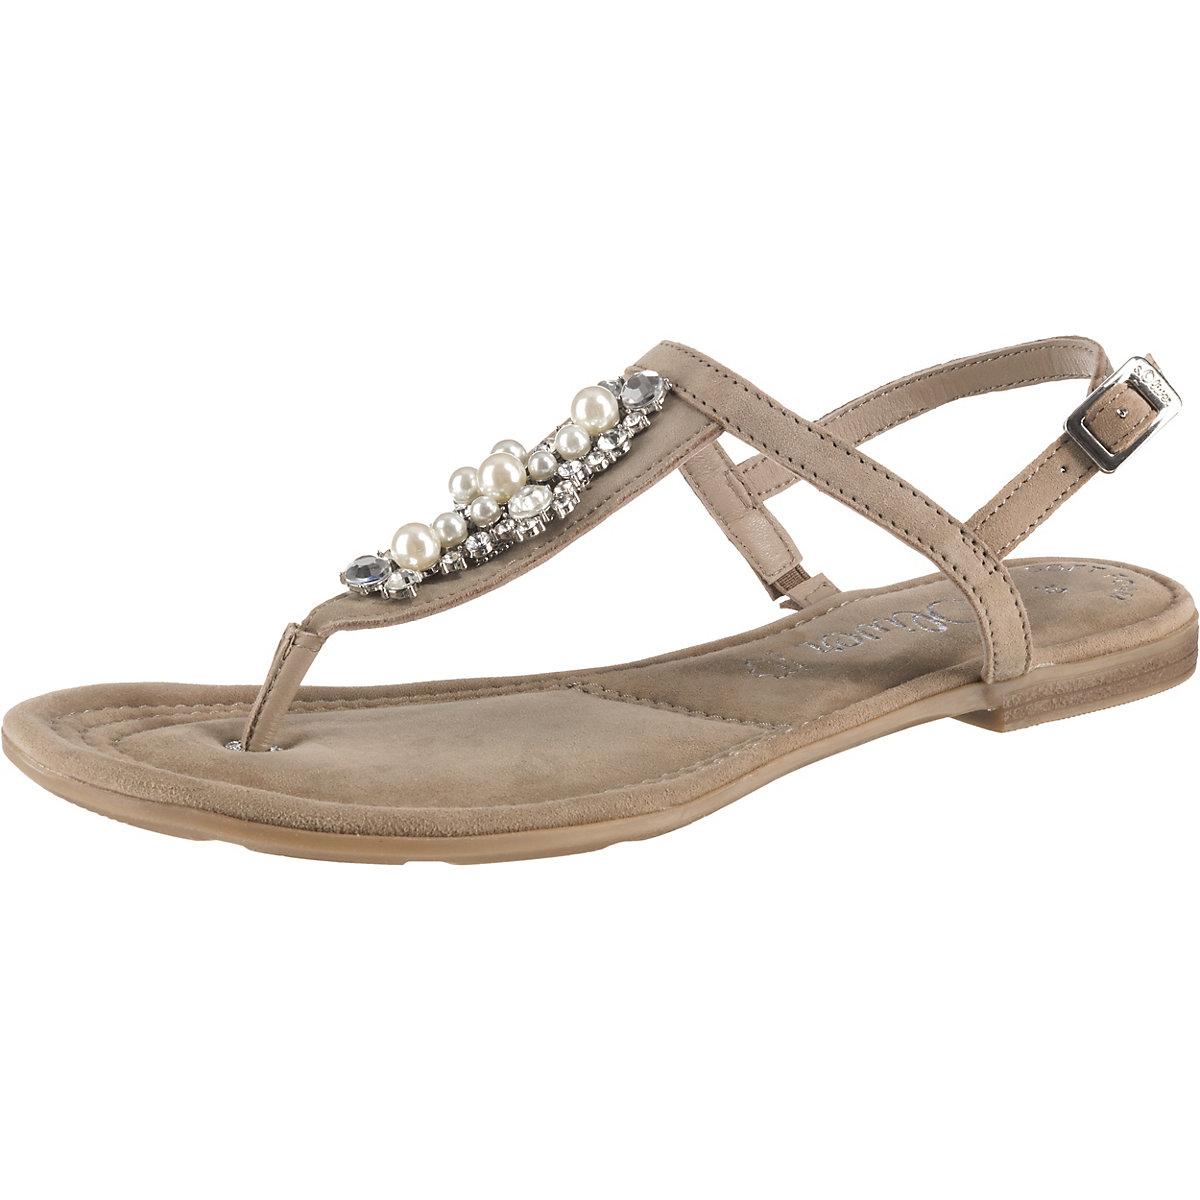 S.Oliver, T-Steg-Sandalen, taupe  Gute Qualität beliebte Schuhe